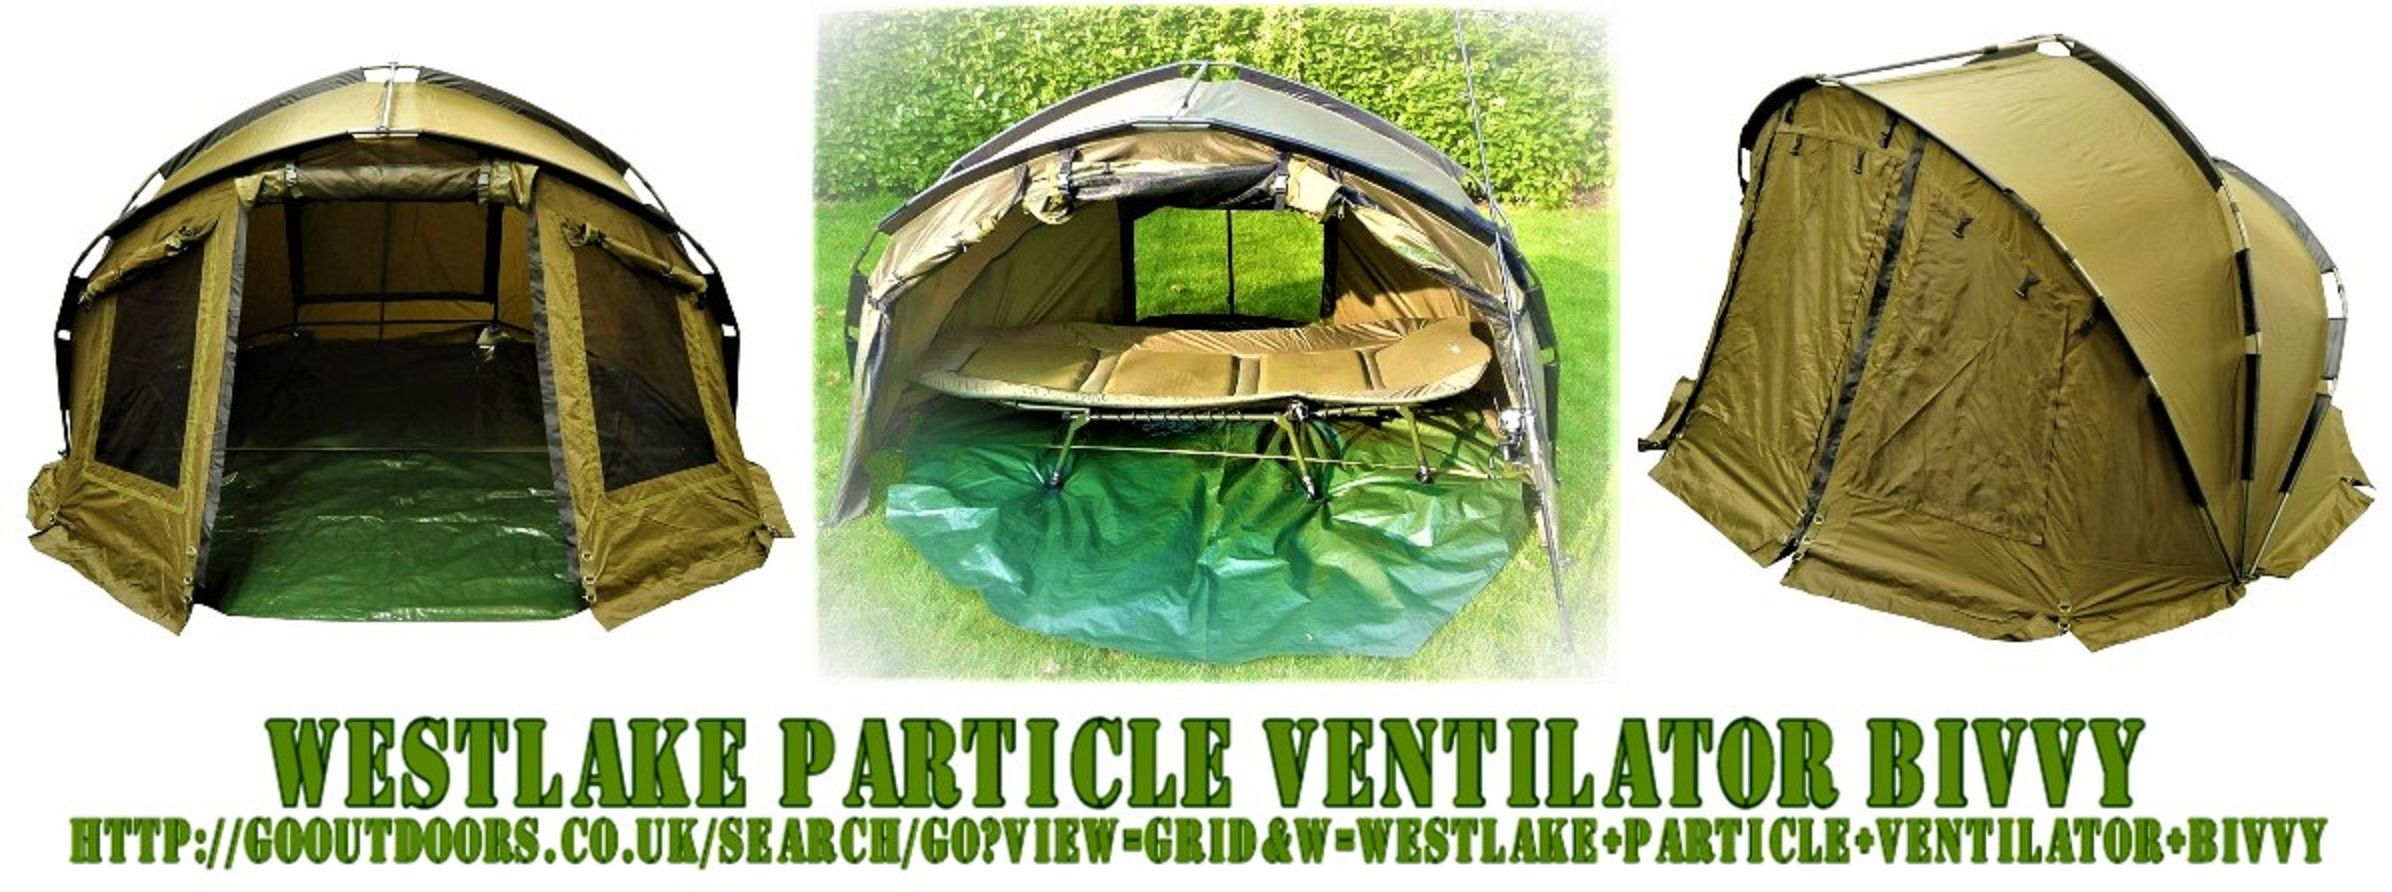 Westlake Particle Ventilator Bivvy. //gooutdoors.co.uk/search  sc 1 st  Pinterest & Westlake Particle Ventilator Bivvy. http://gooutdoors.co.uk/search ...